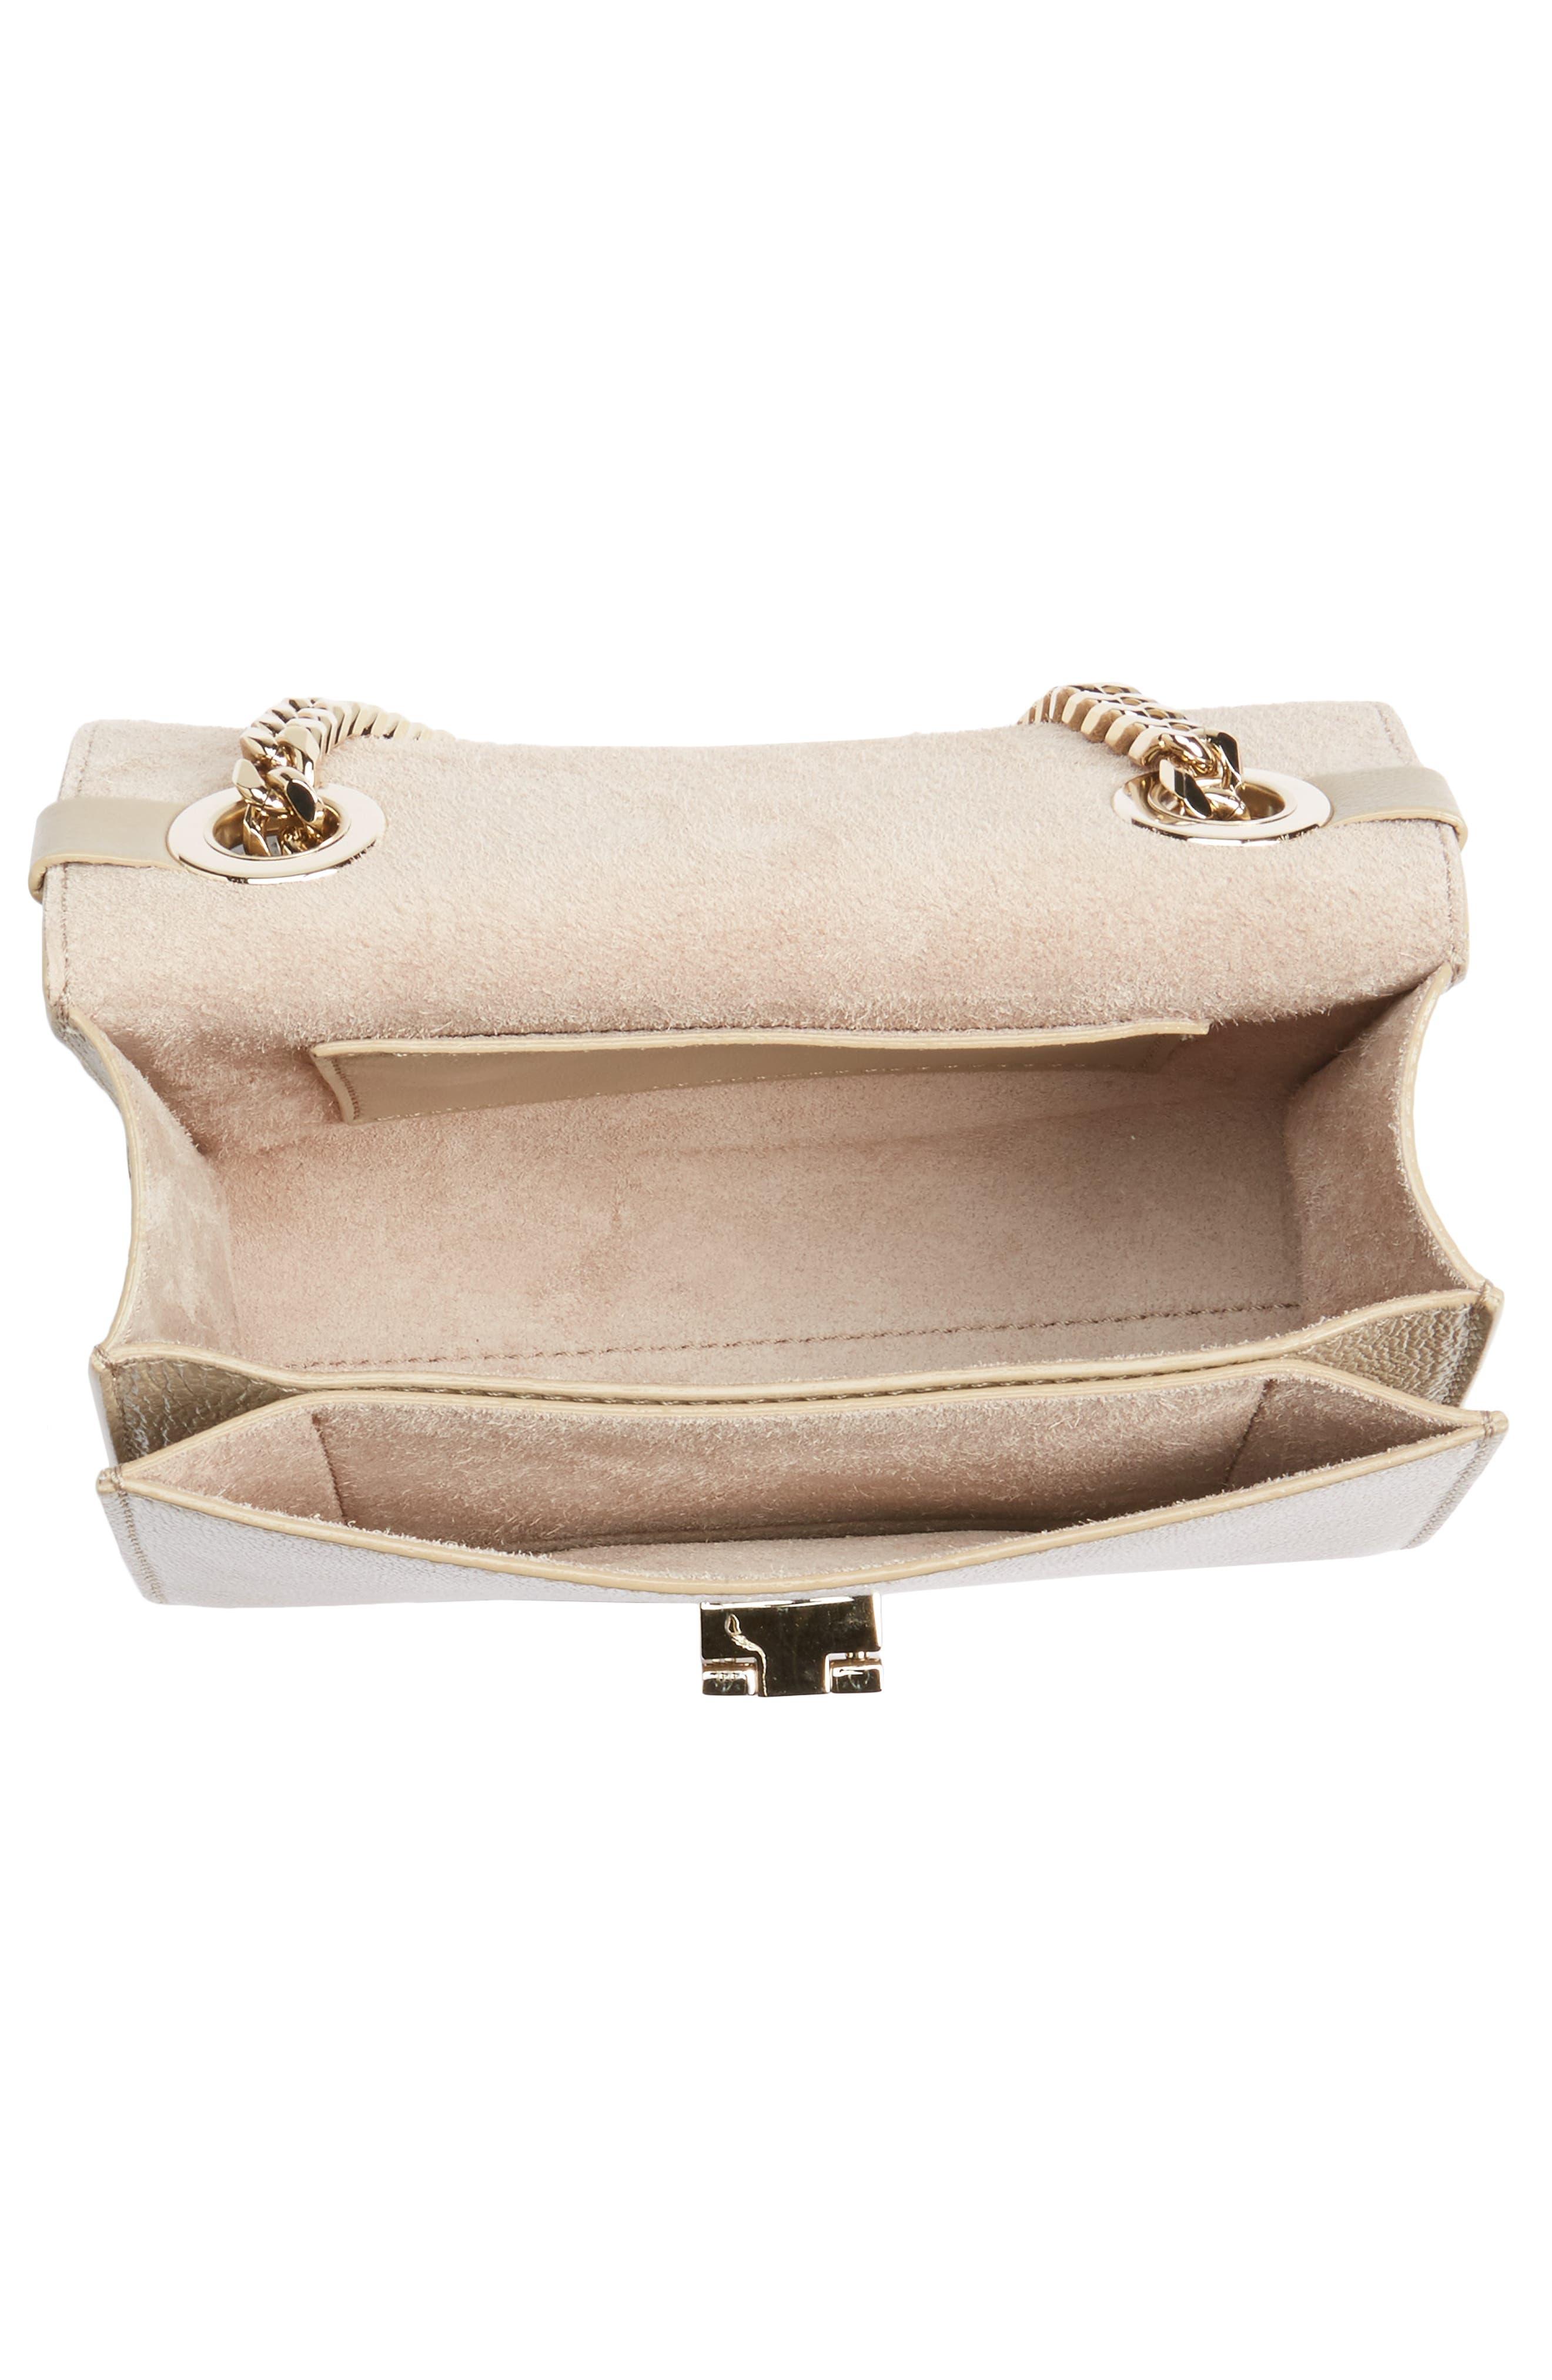 Mini Rebel Leather Crossbody Bag,                             Alternate thumbnail 4, color,                             201